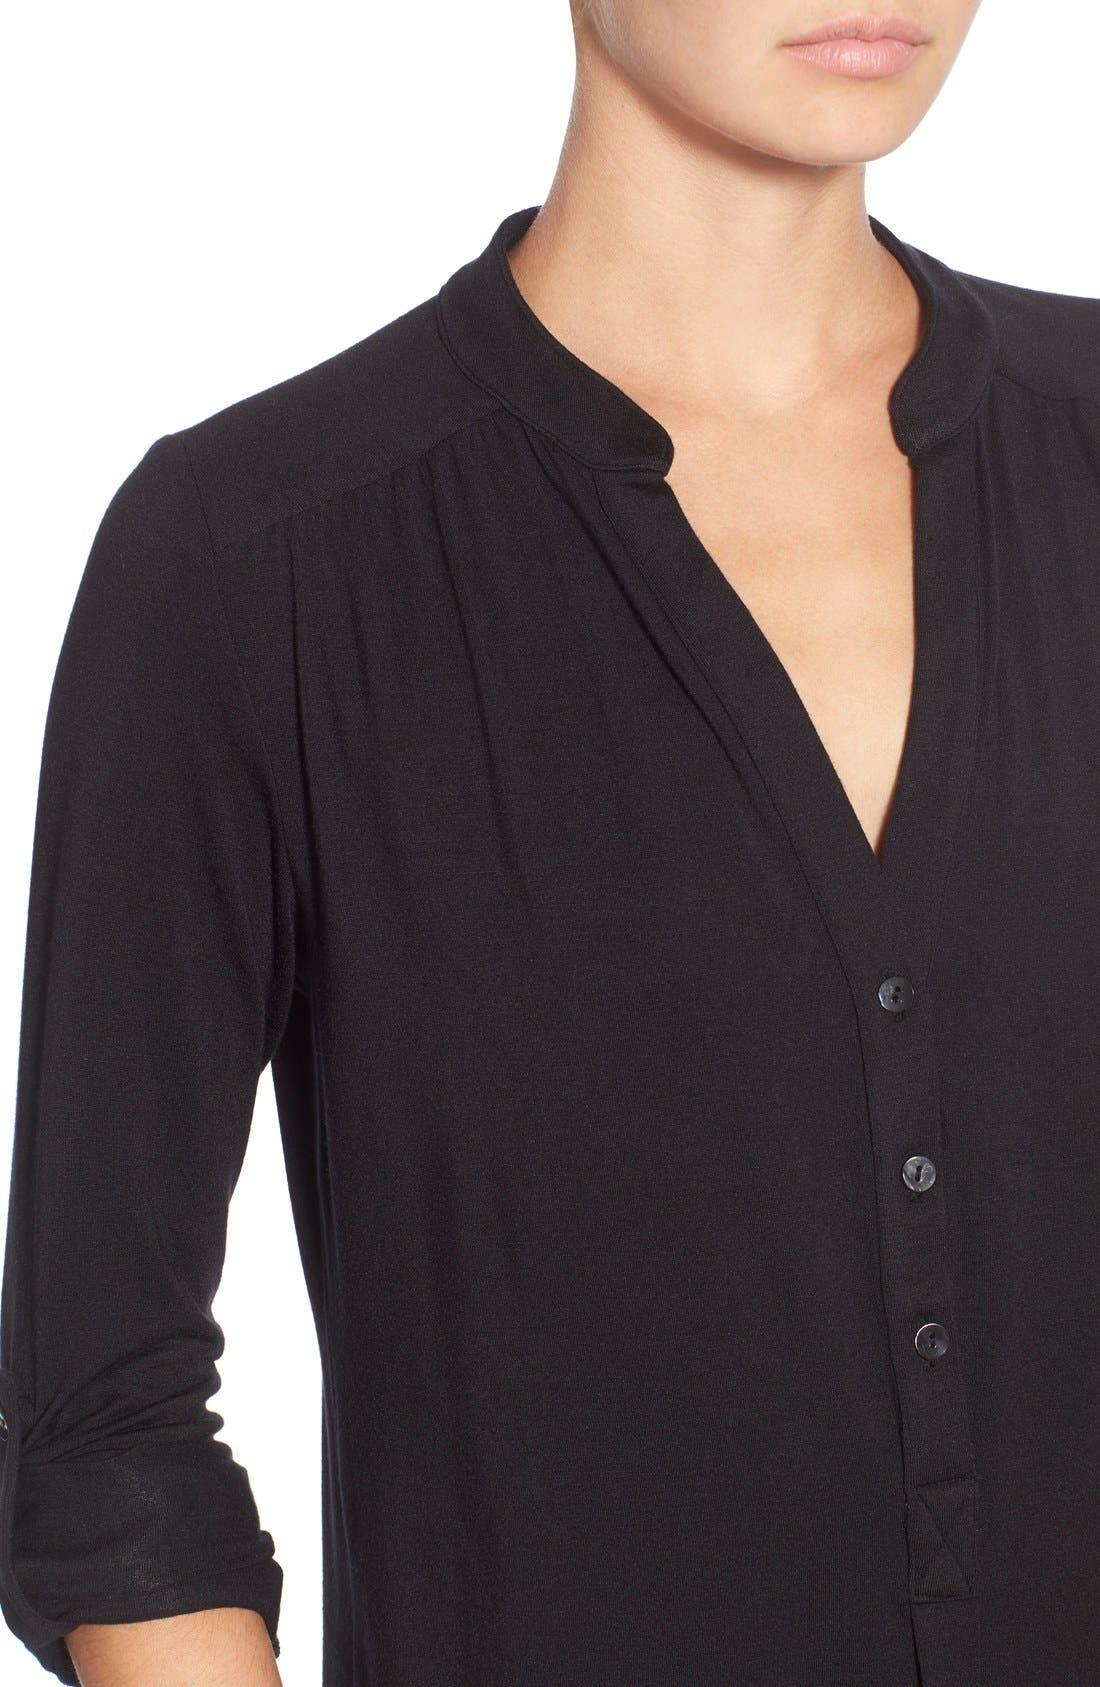 'Elena' Roll Tab Sleeve Top,                             Alternate thumbnail 4, color,                             BLACK